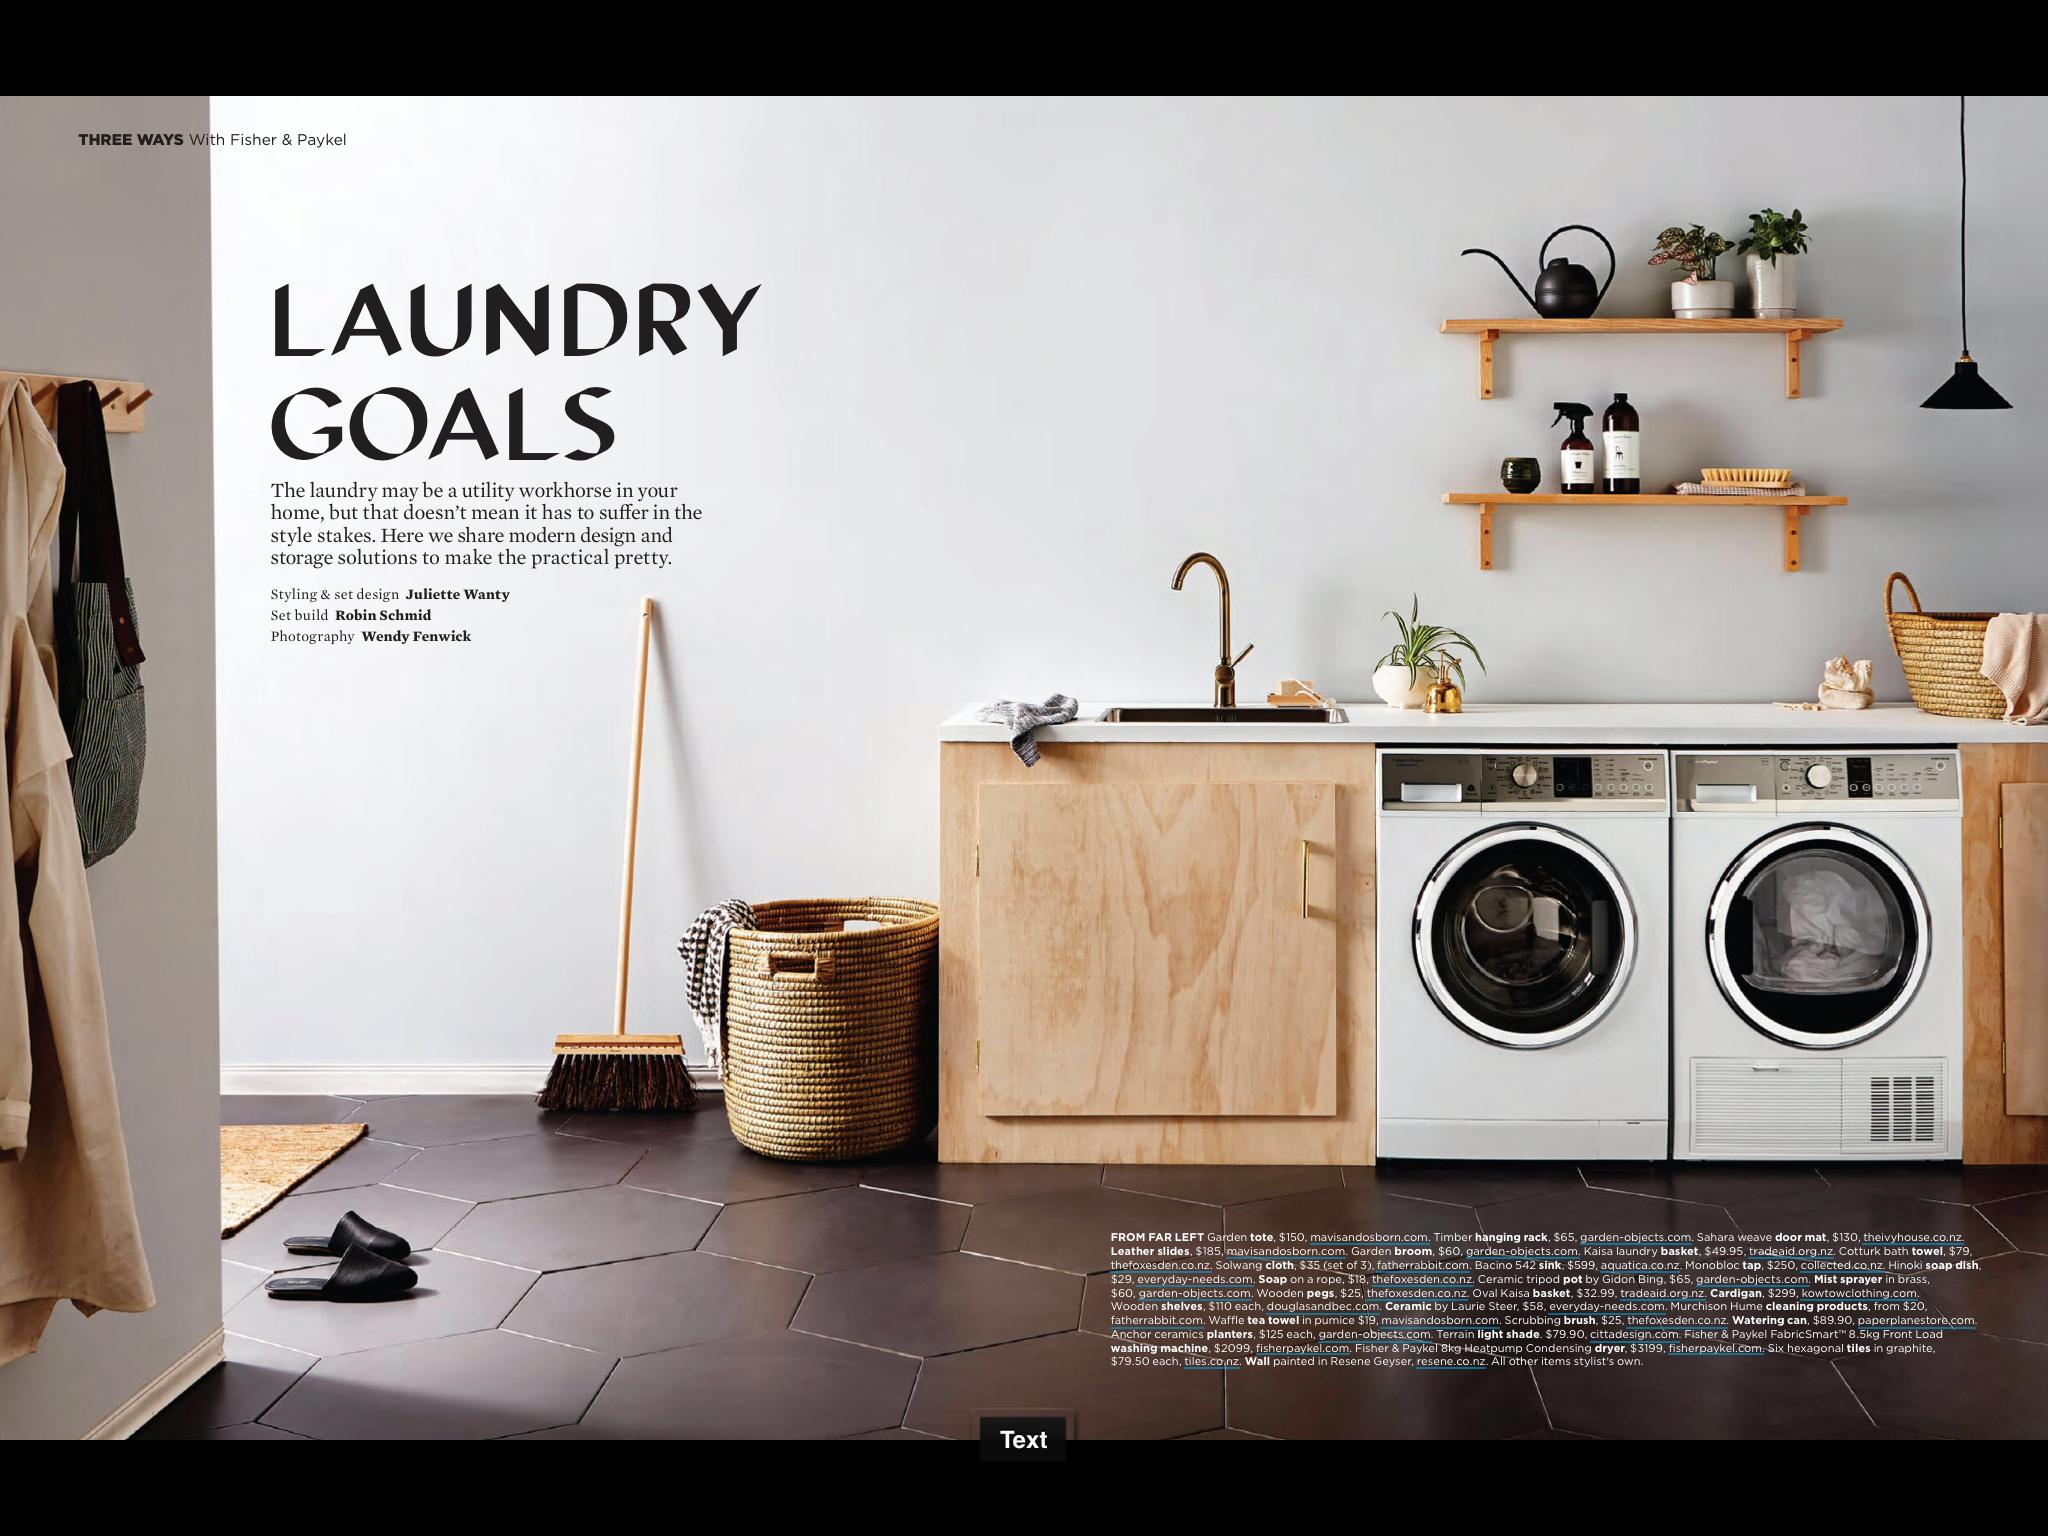 Pin by Amanda Shark on House | Pinterest | Laundry, Laundry rooms ...